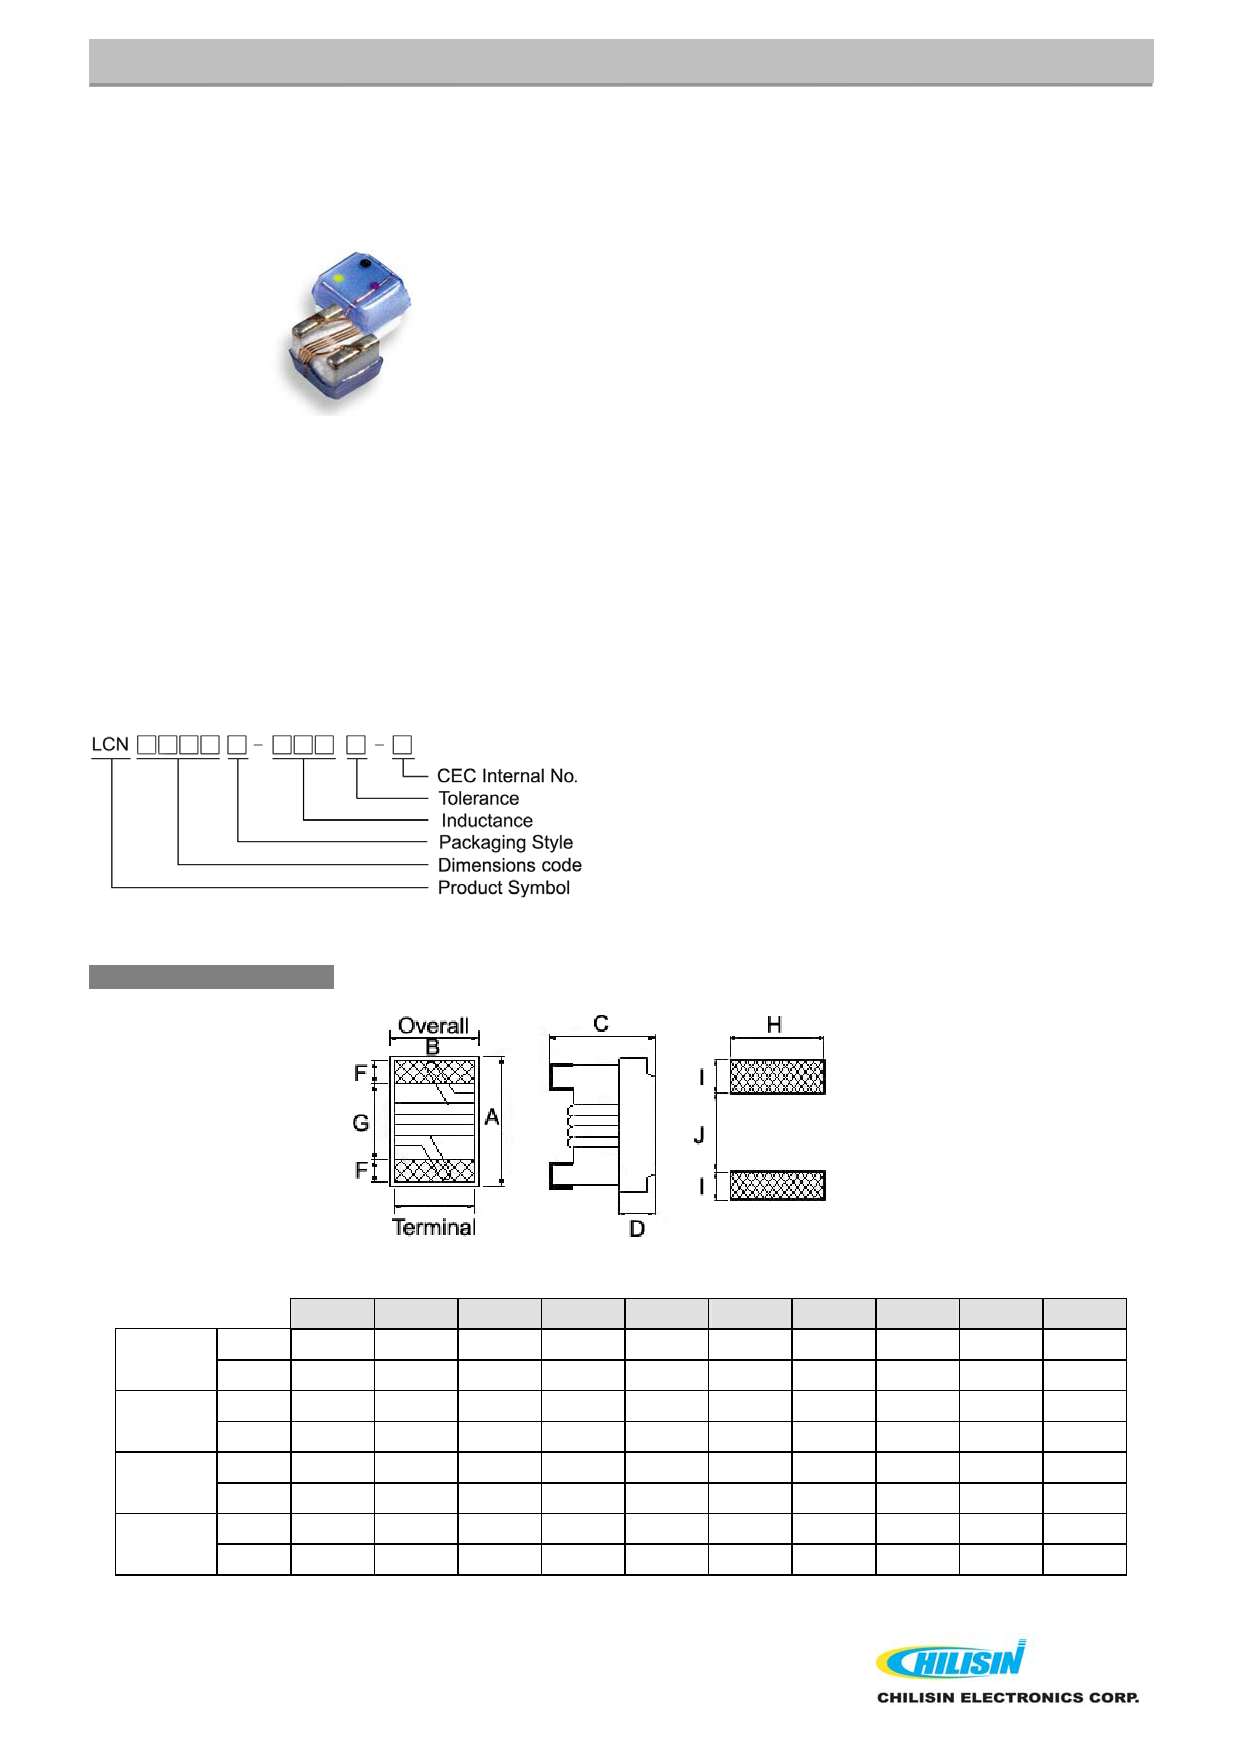 LCN1008T 데이터시트 및 LCN1008T PDF